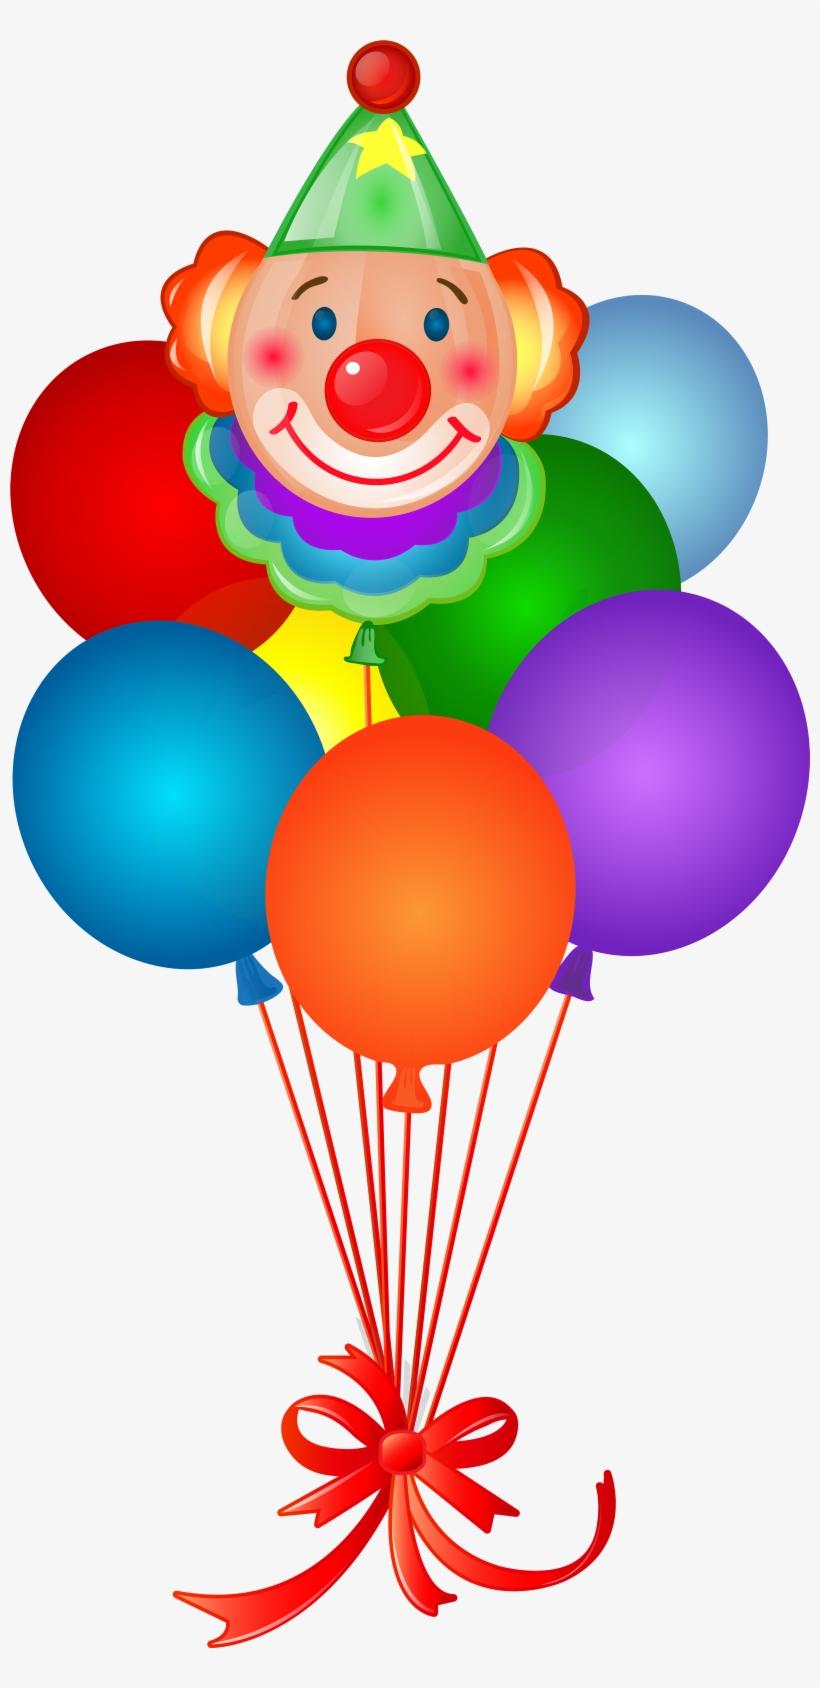 Balon Ultah Png - Nice Blog